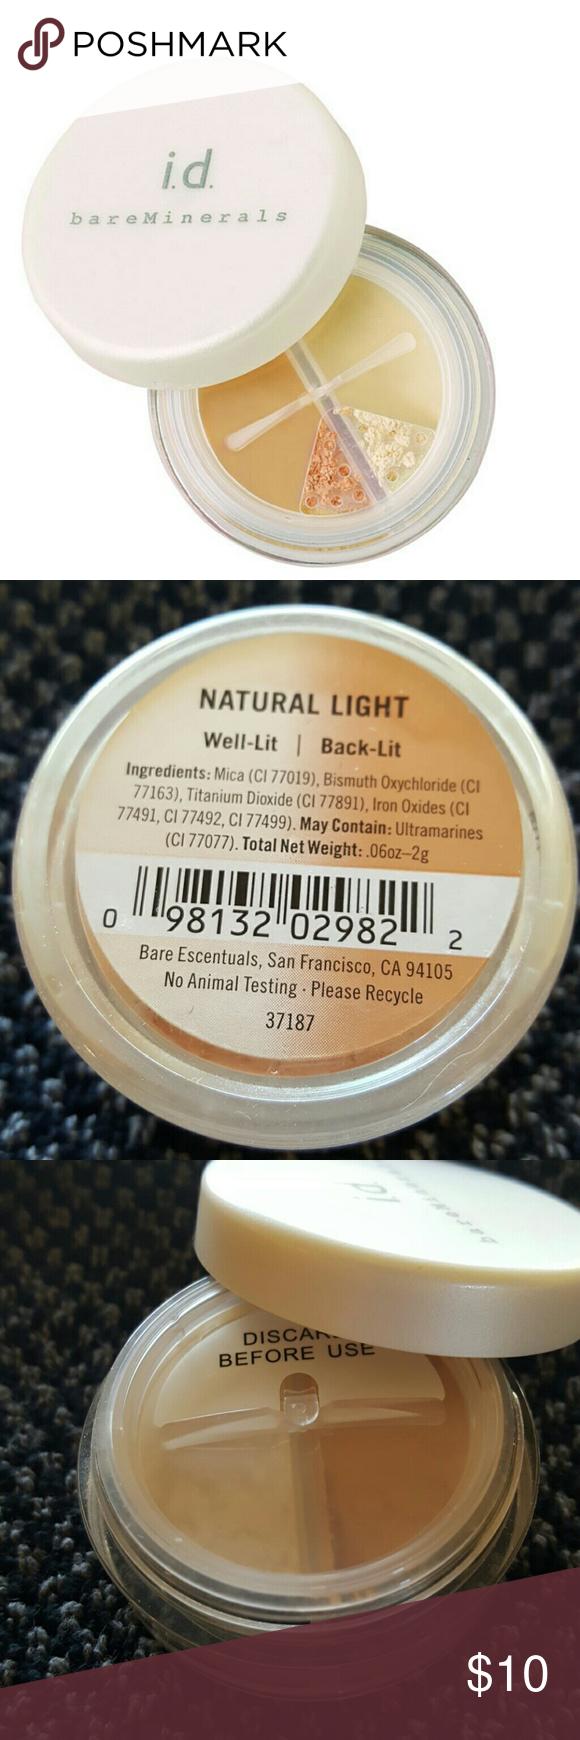 New Highlighting Powder Bareminerals Natural Light Eye Area